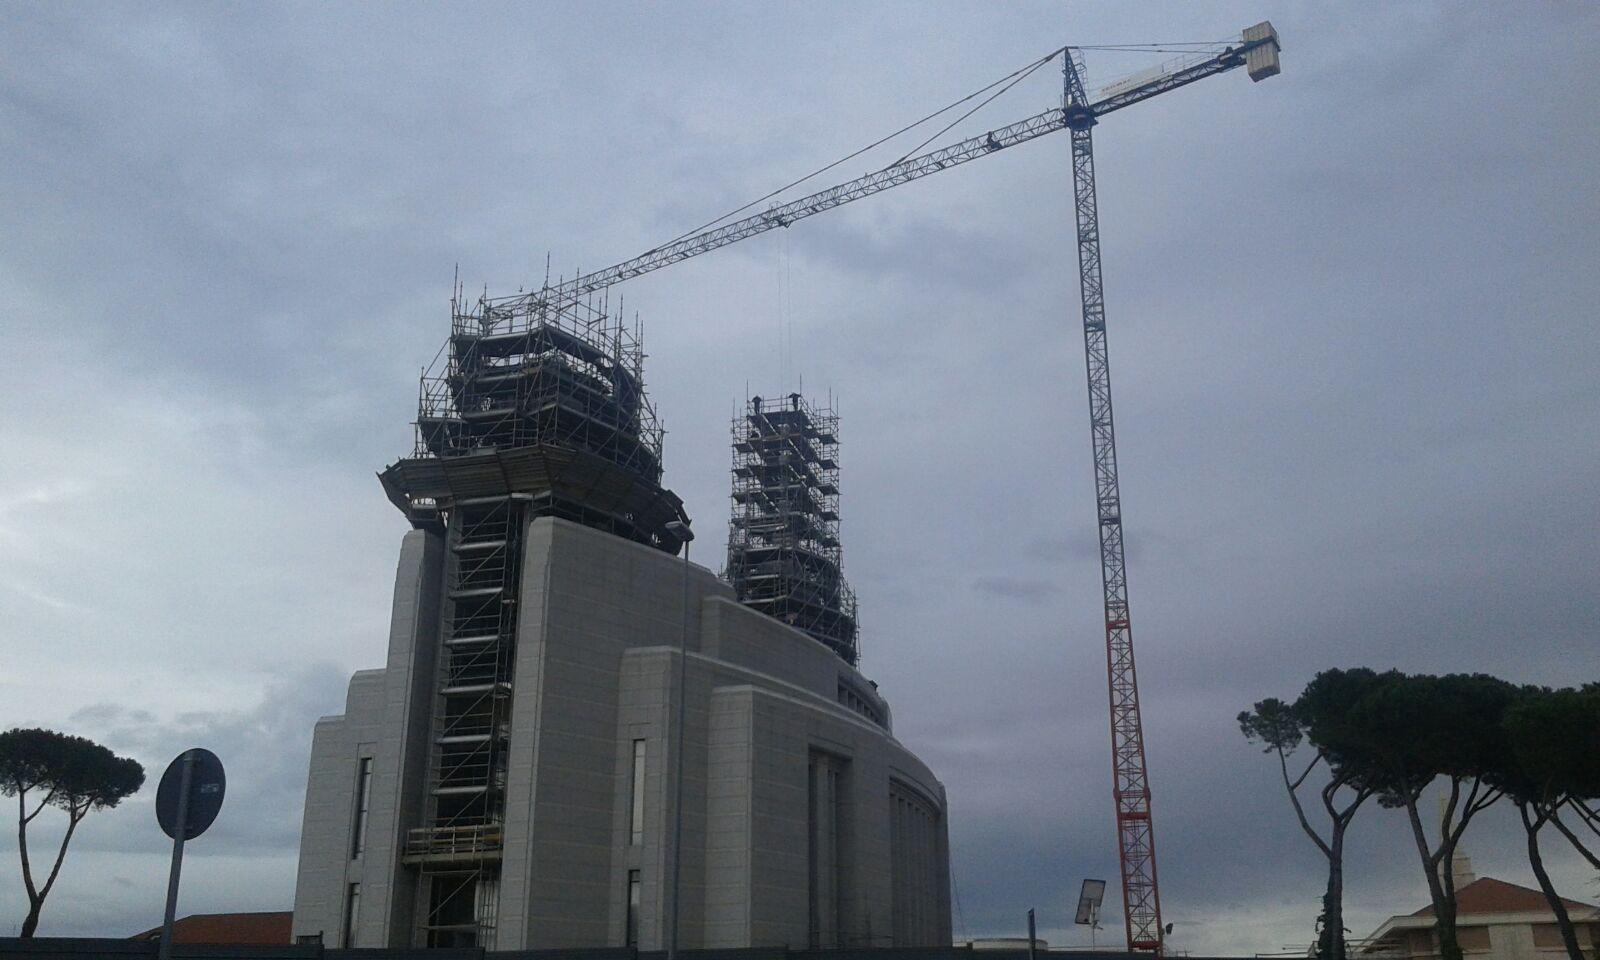 Chiesa dei Mormoni – Roma – Gru a torre Saez mod. S52